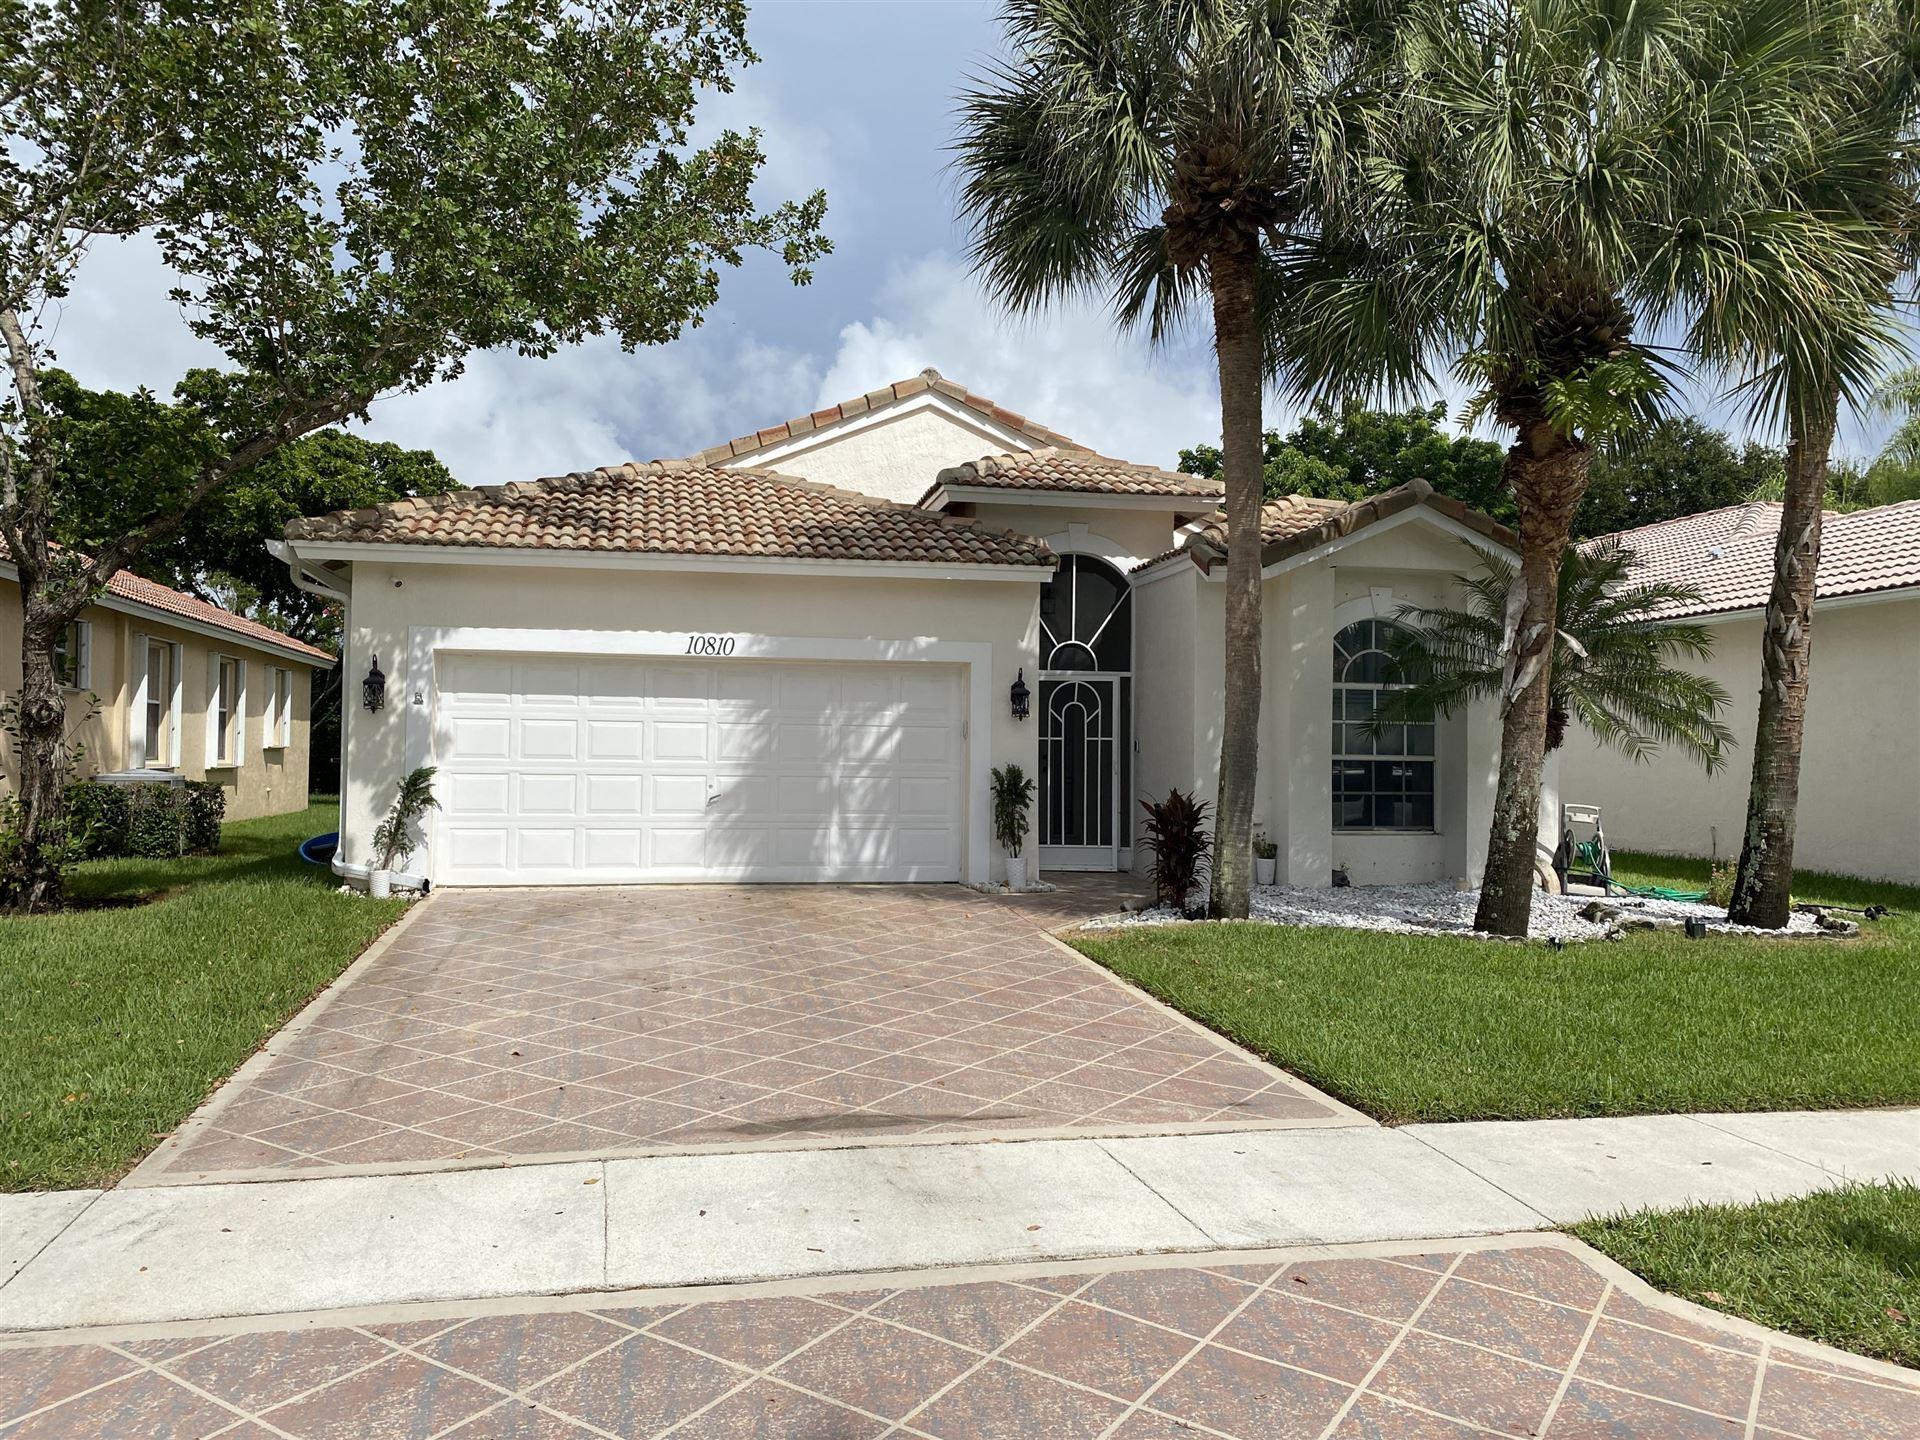 10810 Madison Drive, Boynton Beach, FL 33437 - #: RX-10654484